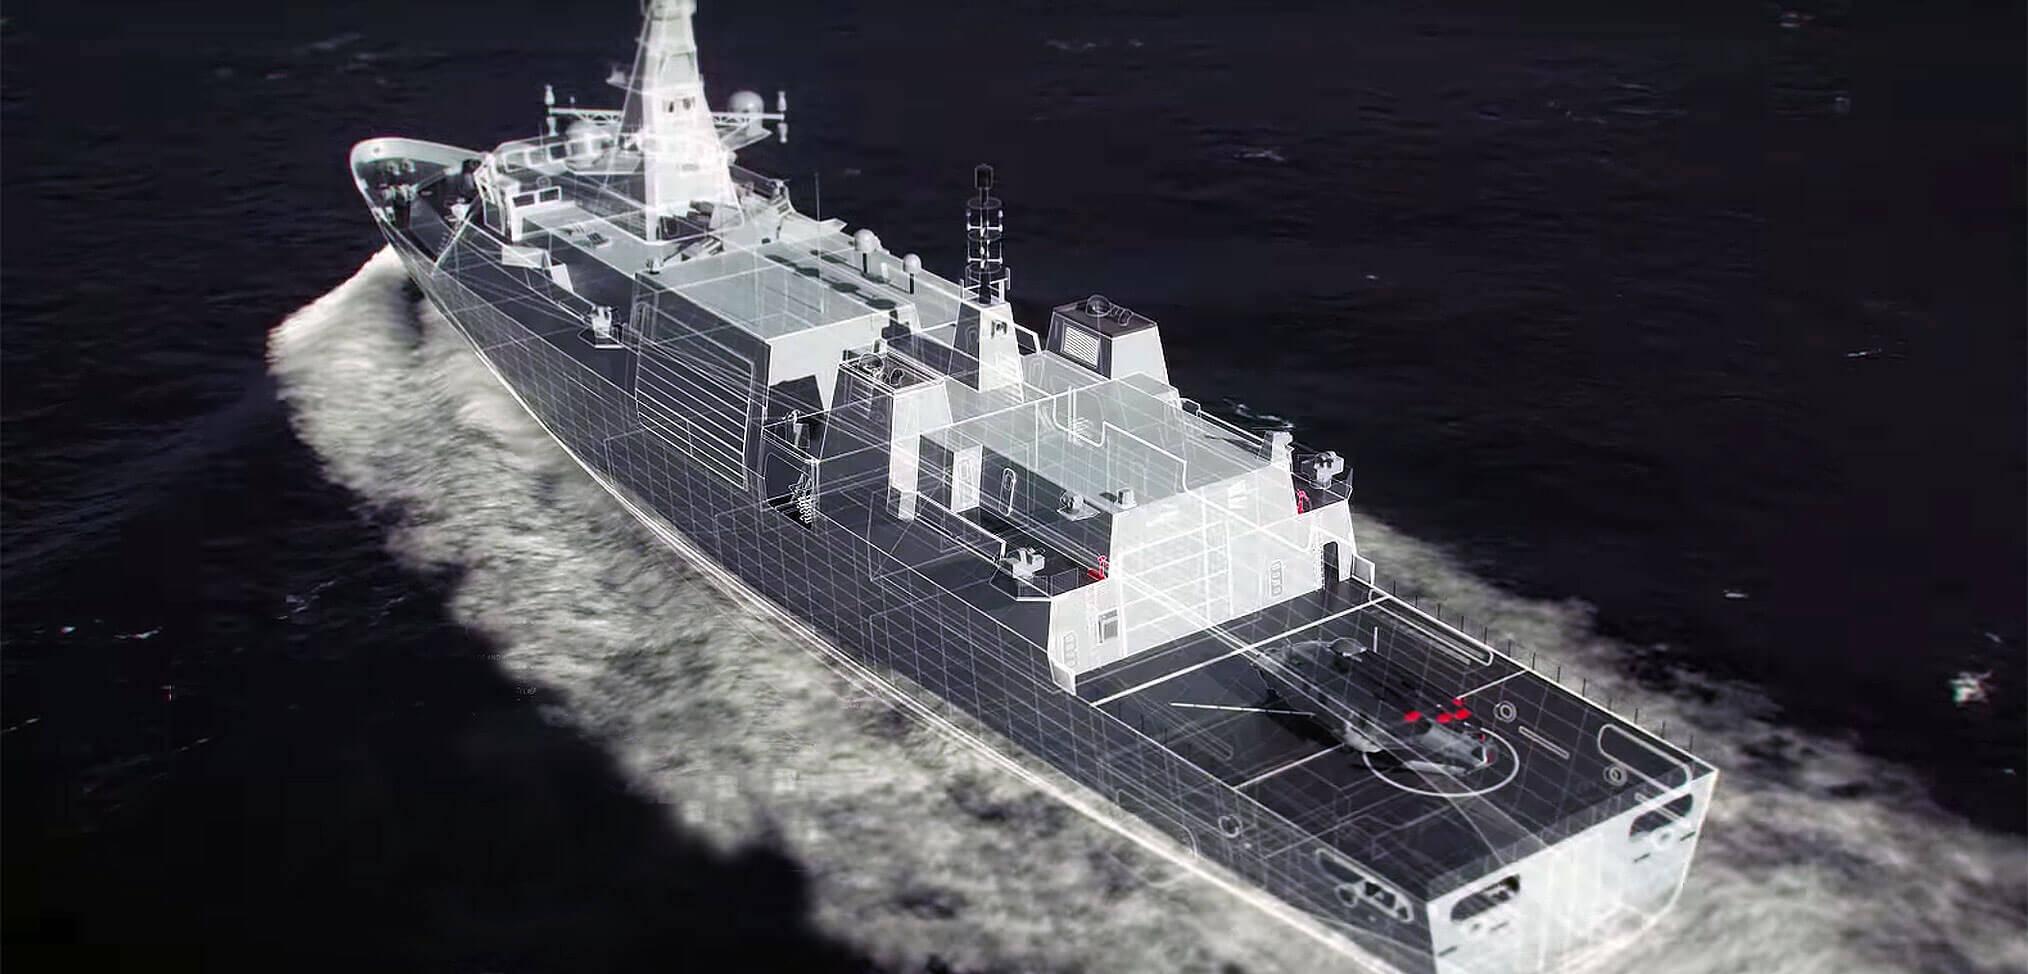 Should the Type 31e frigate be reclassified as a corvette?